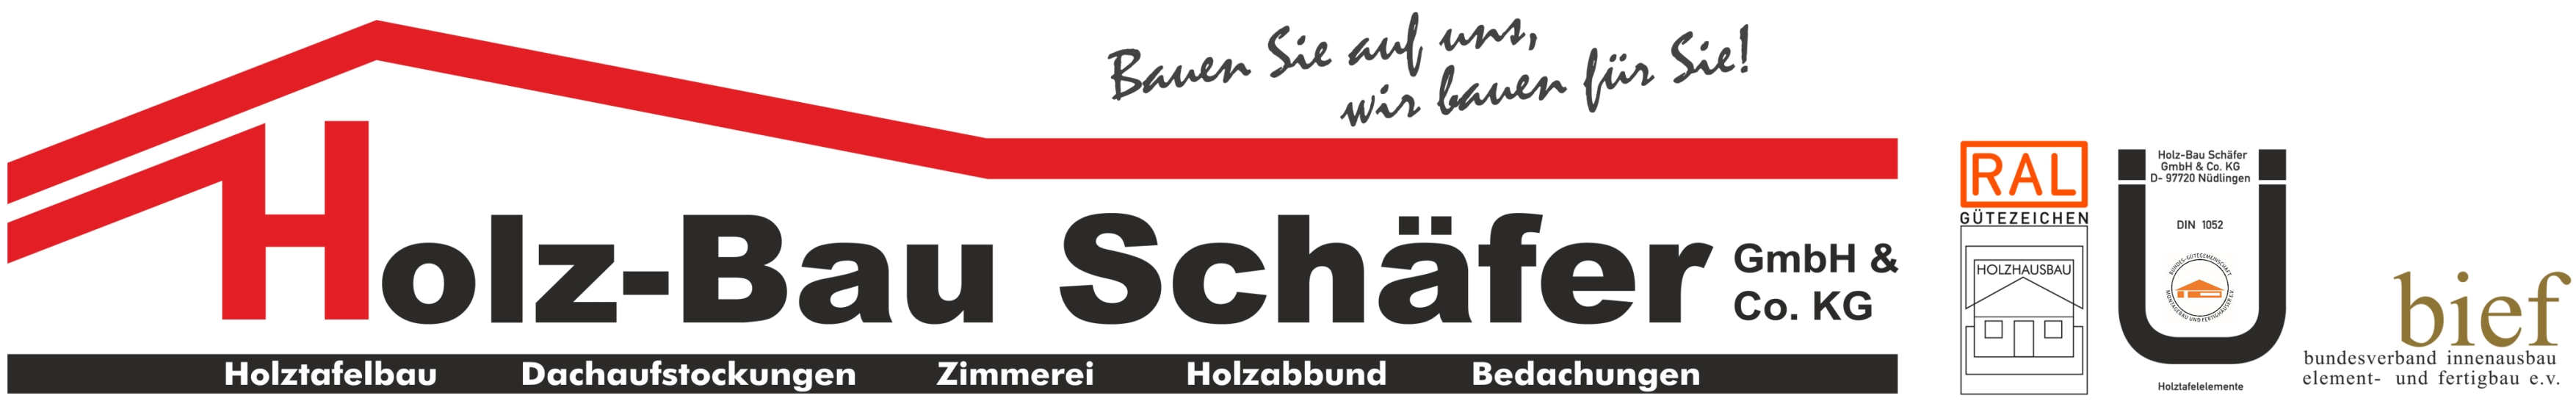 Holz Bau Schäfer